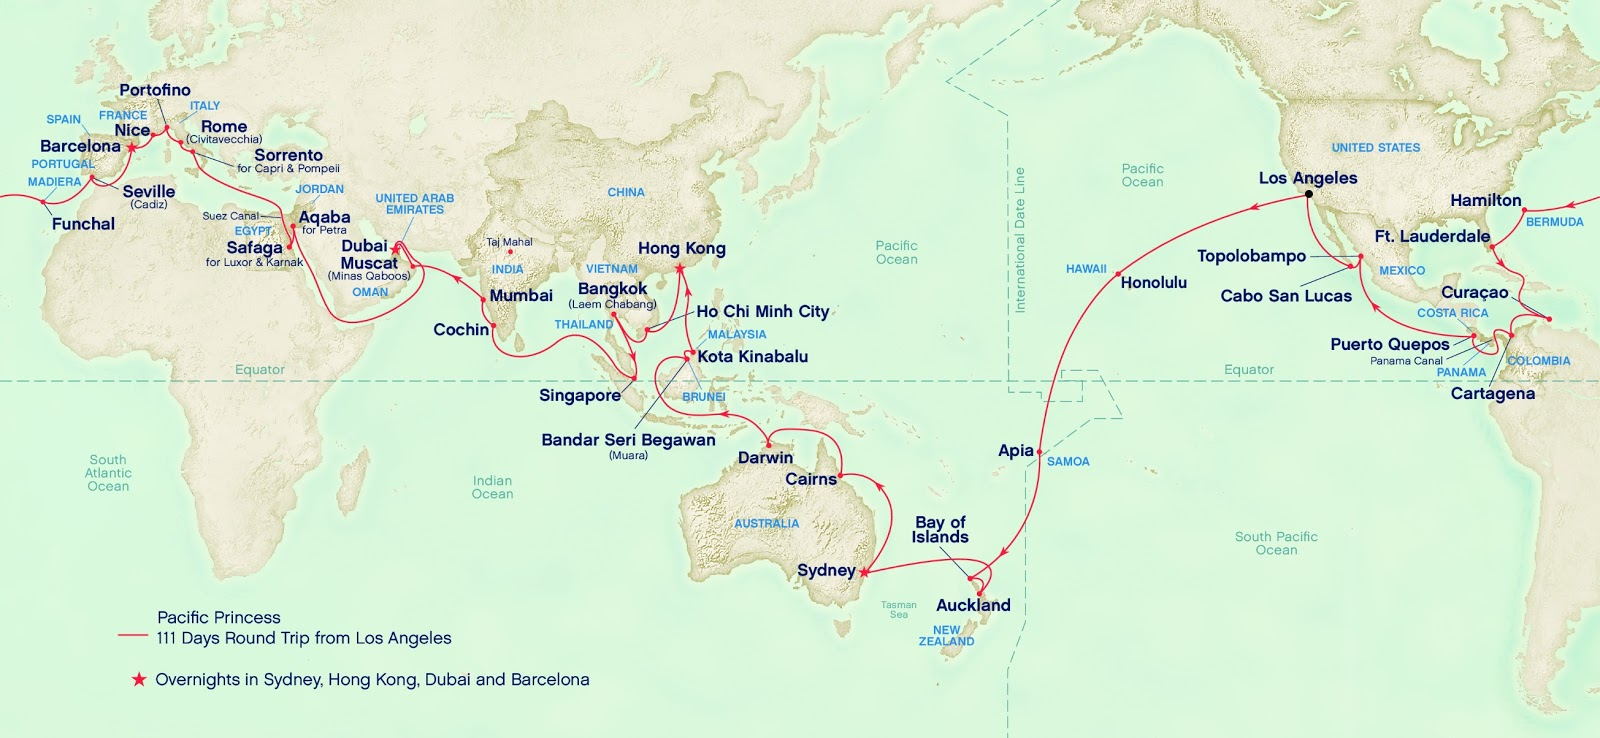 World cruise 2015 world cruise 2015 map for Cruise around the world